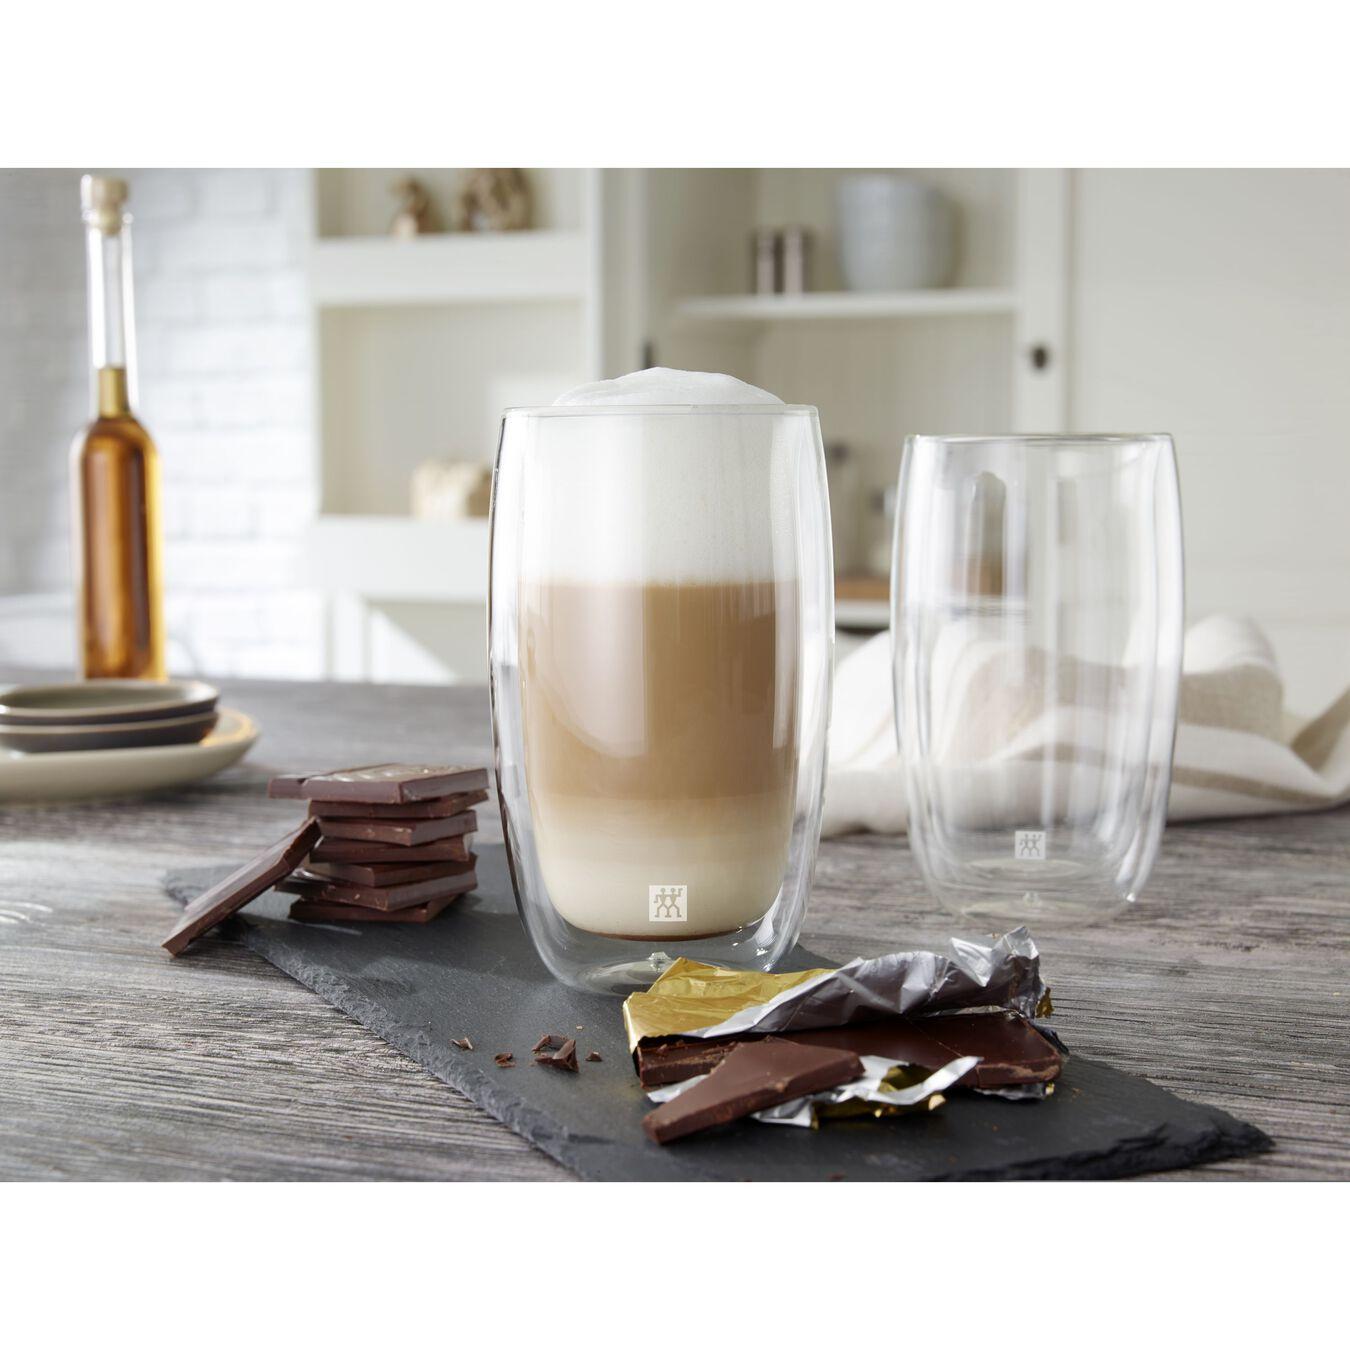 8 Piece Latte Glass Set - Value Pack,,large 3